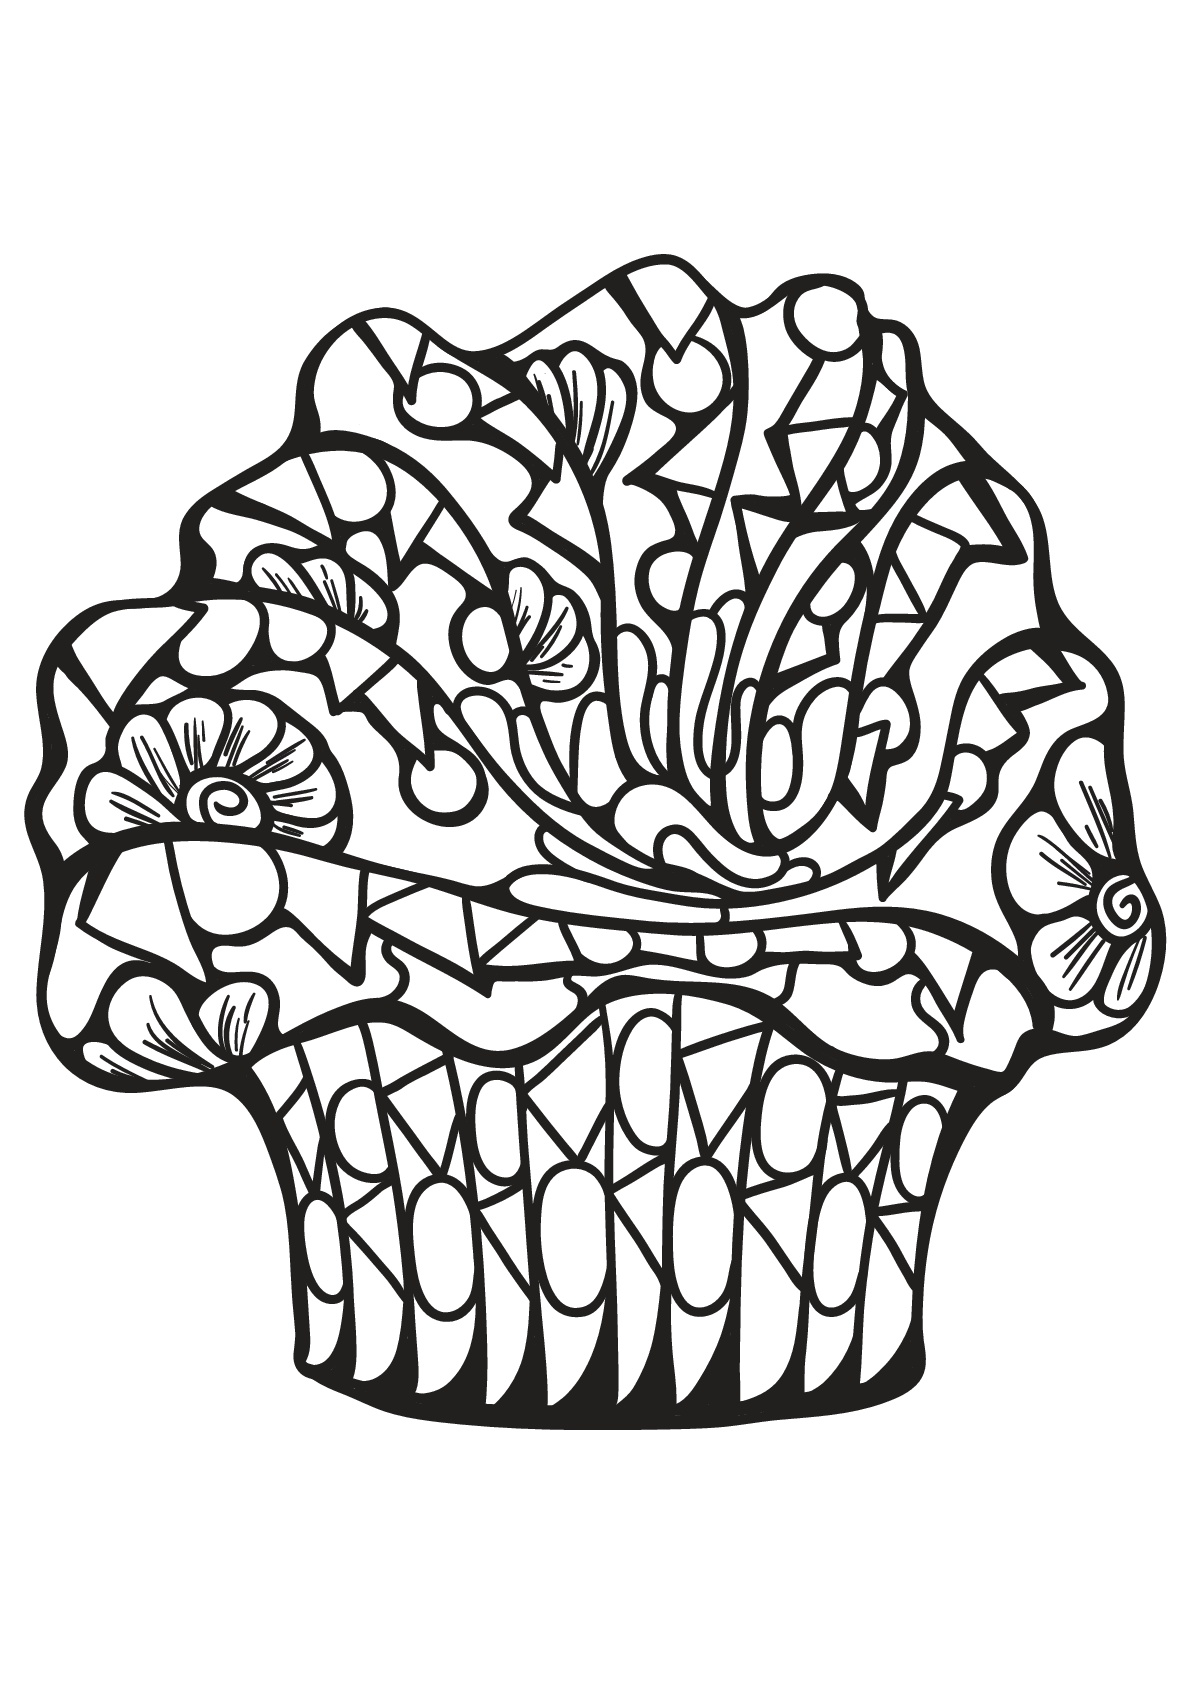 Cupcake 7 - Image avec : Papillon